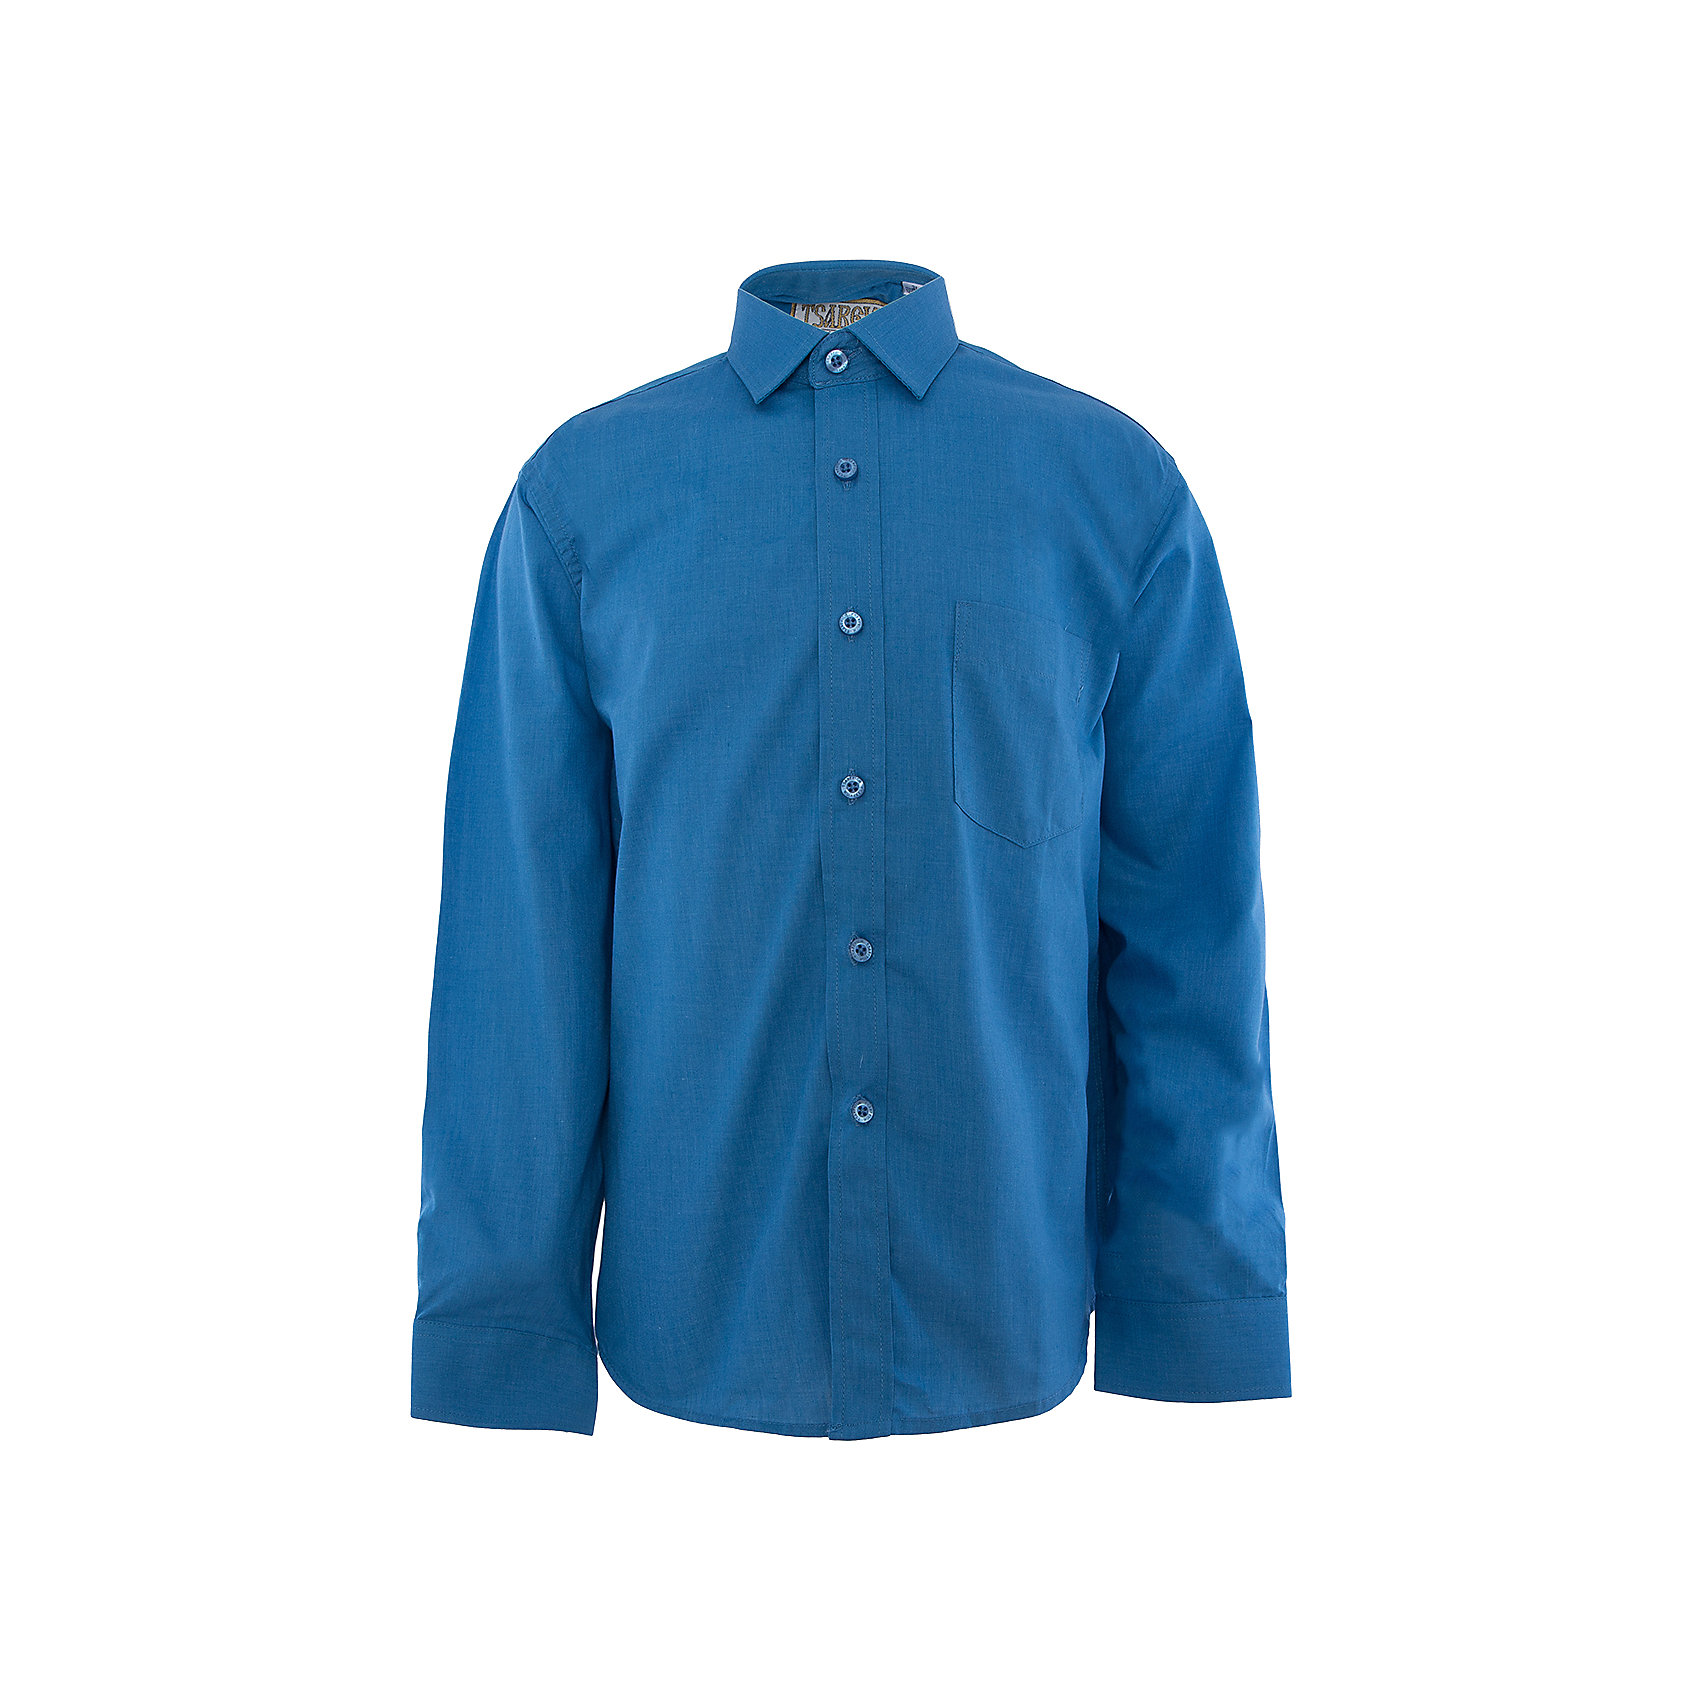 Рубашка для мальчика  TsarevichБлузки и рубашки<br>Рубашка для мальчика от российской марки Tsarevich.<br>Состав:<br>80% хлопок  20% полиэстер<br><br>Ширина мм: 174<br>Глубина мм: 10<br>Высота мм: 169<br>Вес г: 157<br>Цвет: голубой<br>Возраст от месяцев: 108<br>Возраст до месяцев: 120<br>Пол: Мужской<br>Возраст: Детский<br>Размер: 134/140,122/128,164/170,128/134,158/164,152/158,146/152,140/146<br>SKU: 4163672